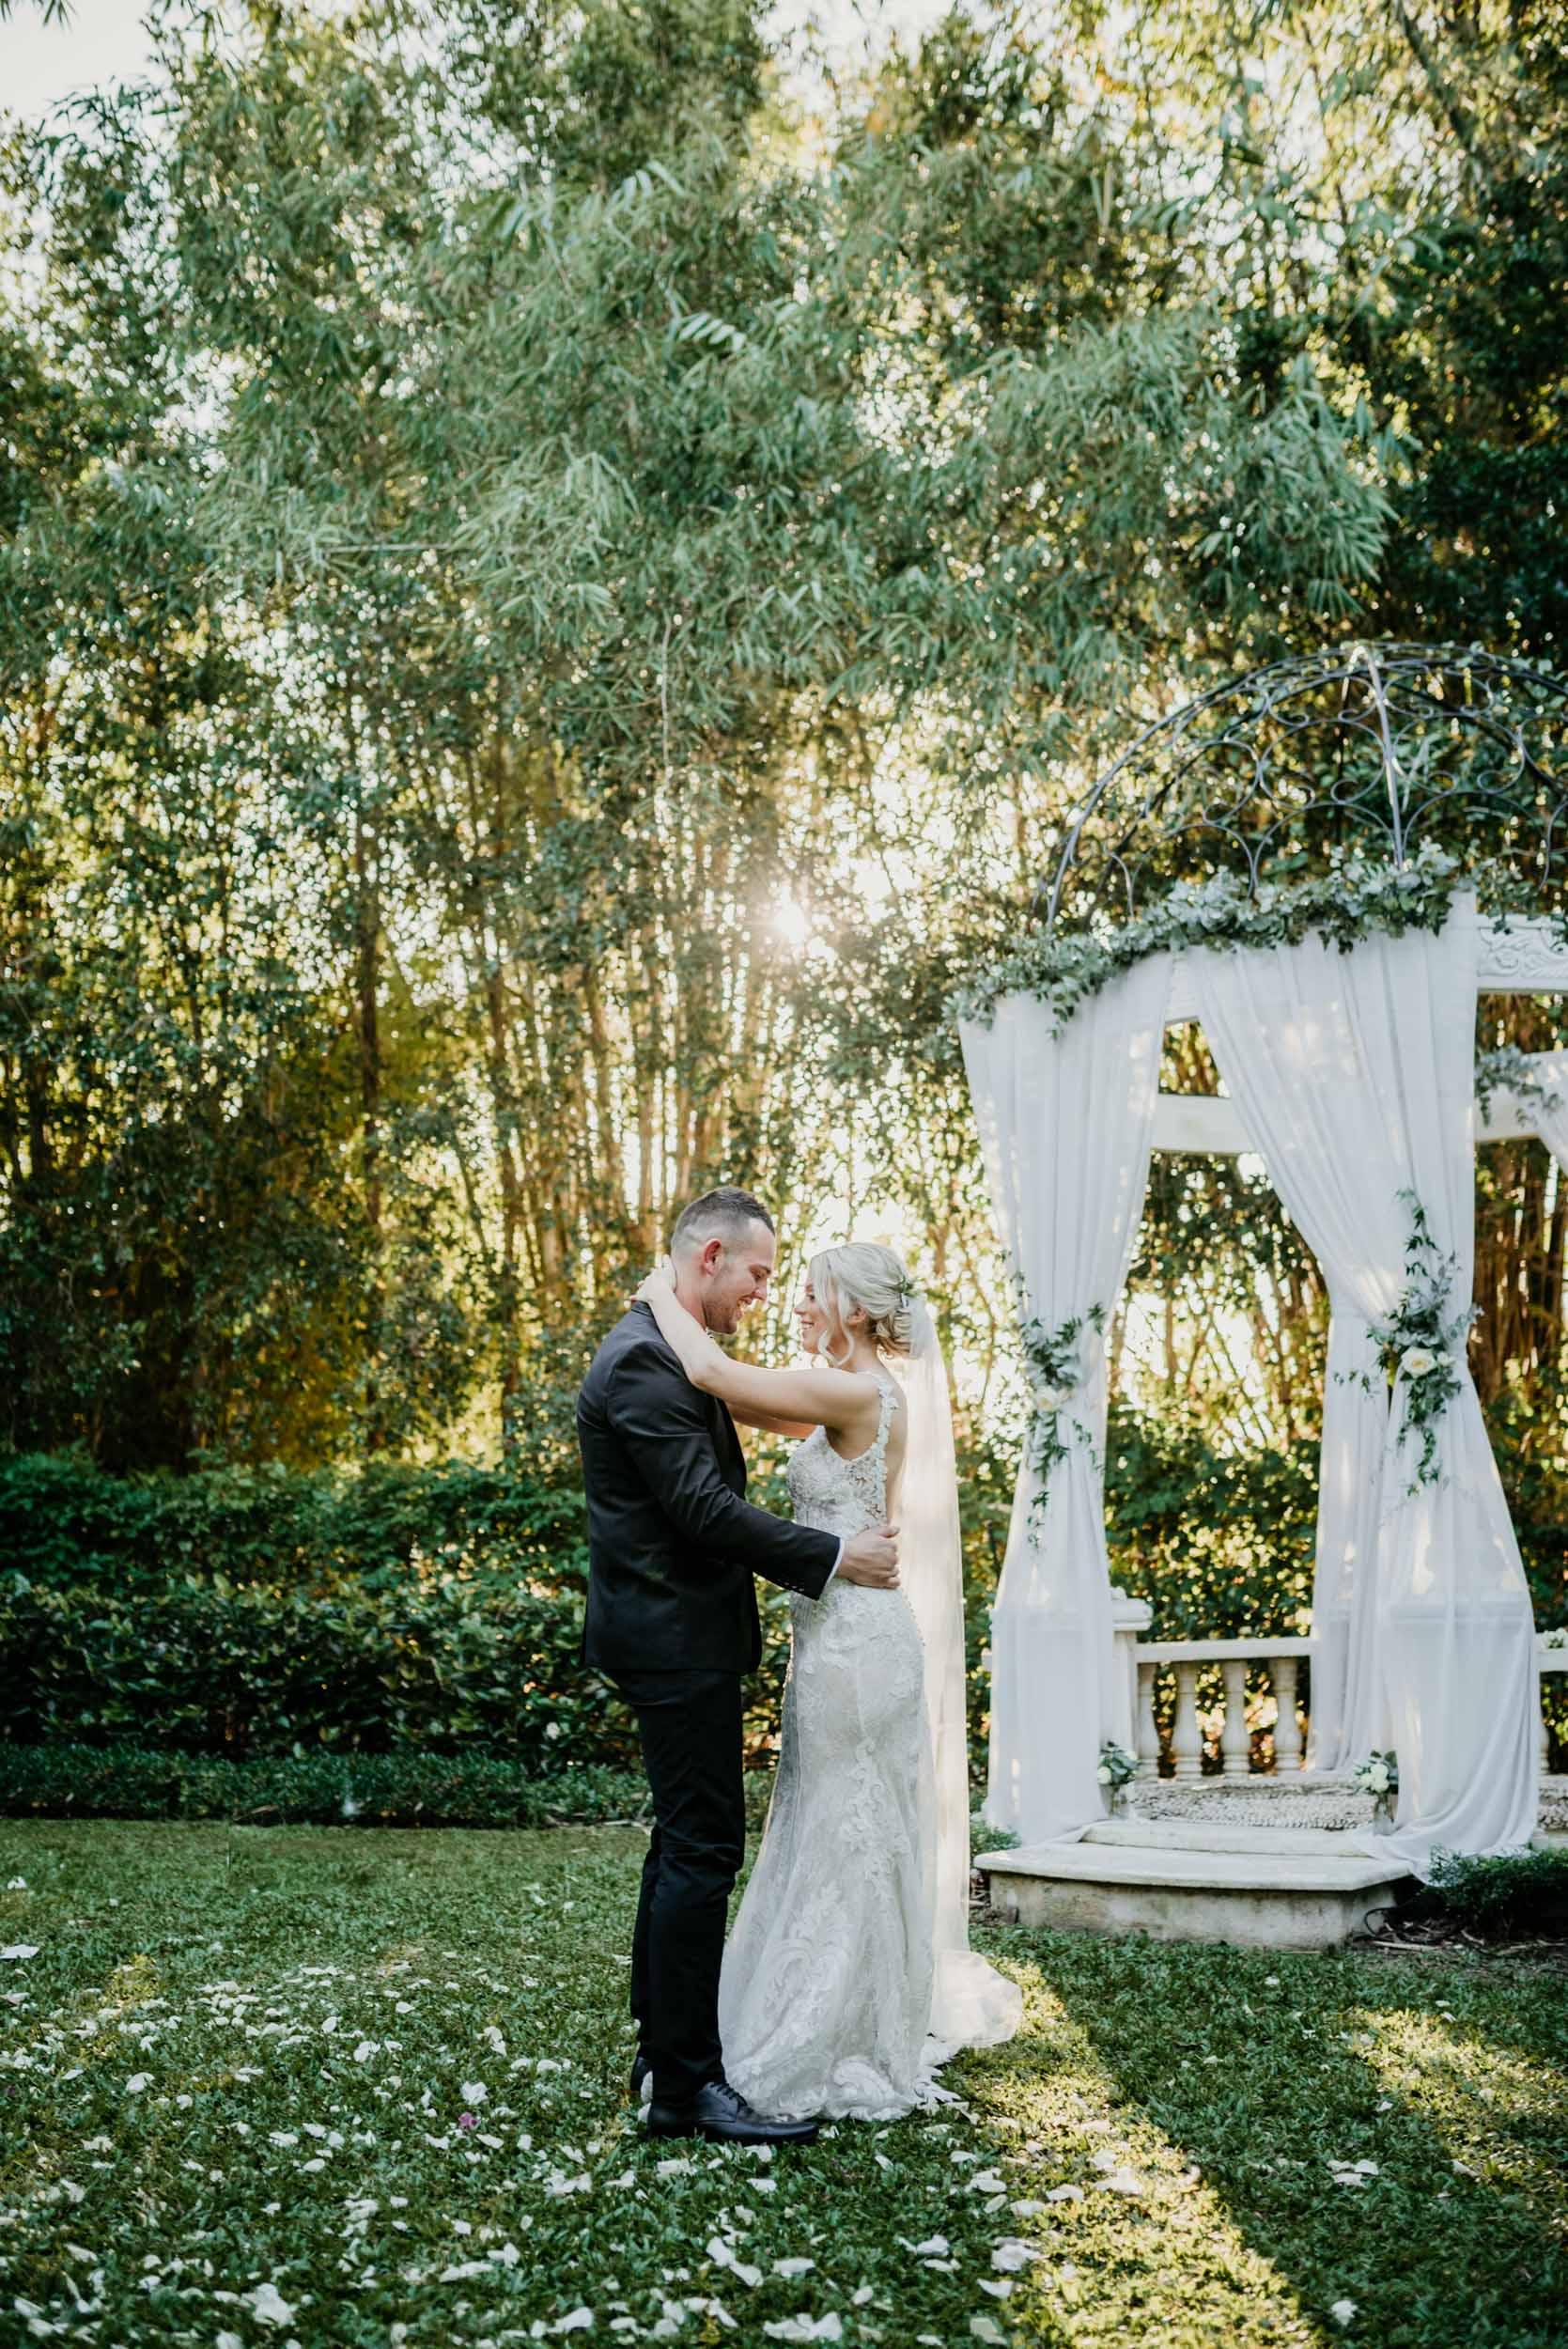 The Raw Photographer - Cairns Wedding Photographer - Laloli - Cairns Garden Wedding - Bride Dress - Destination Wed - Outdoor Reception - Queensland Ceremony-45.jpg